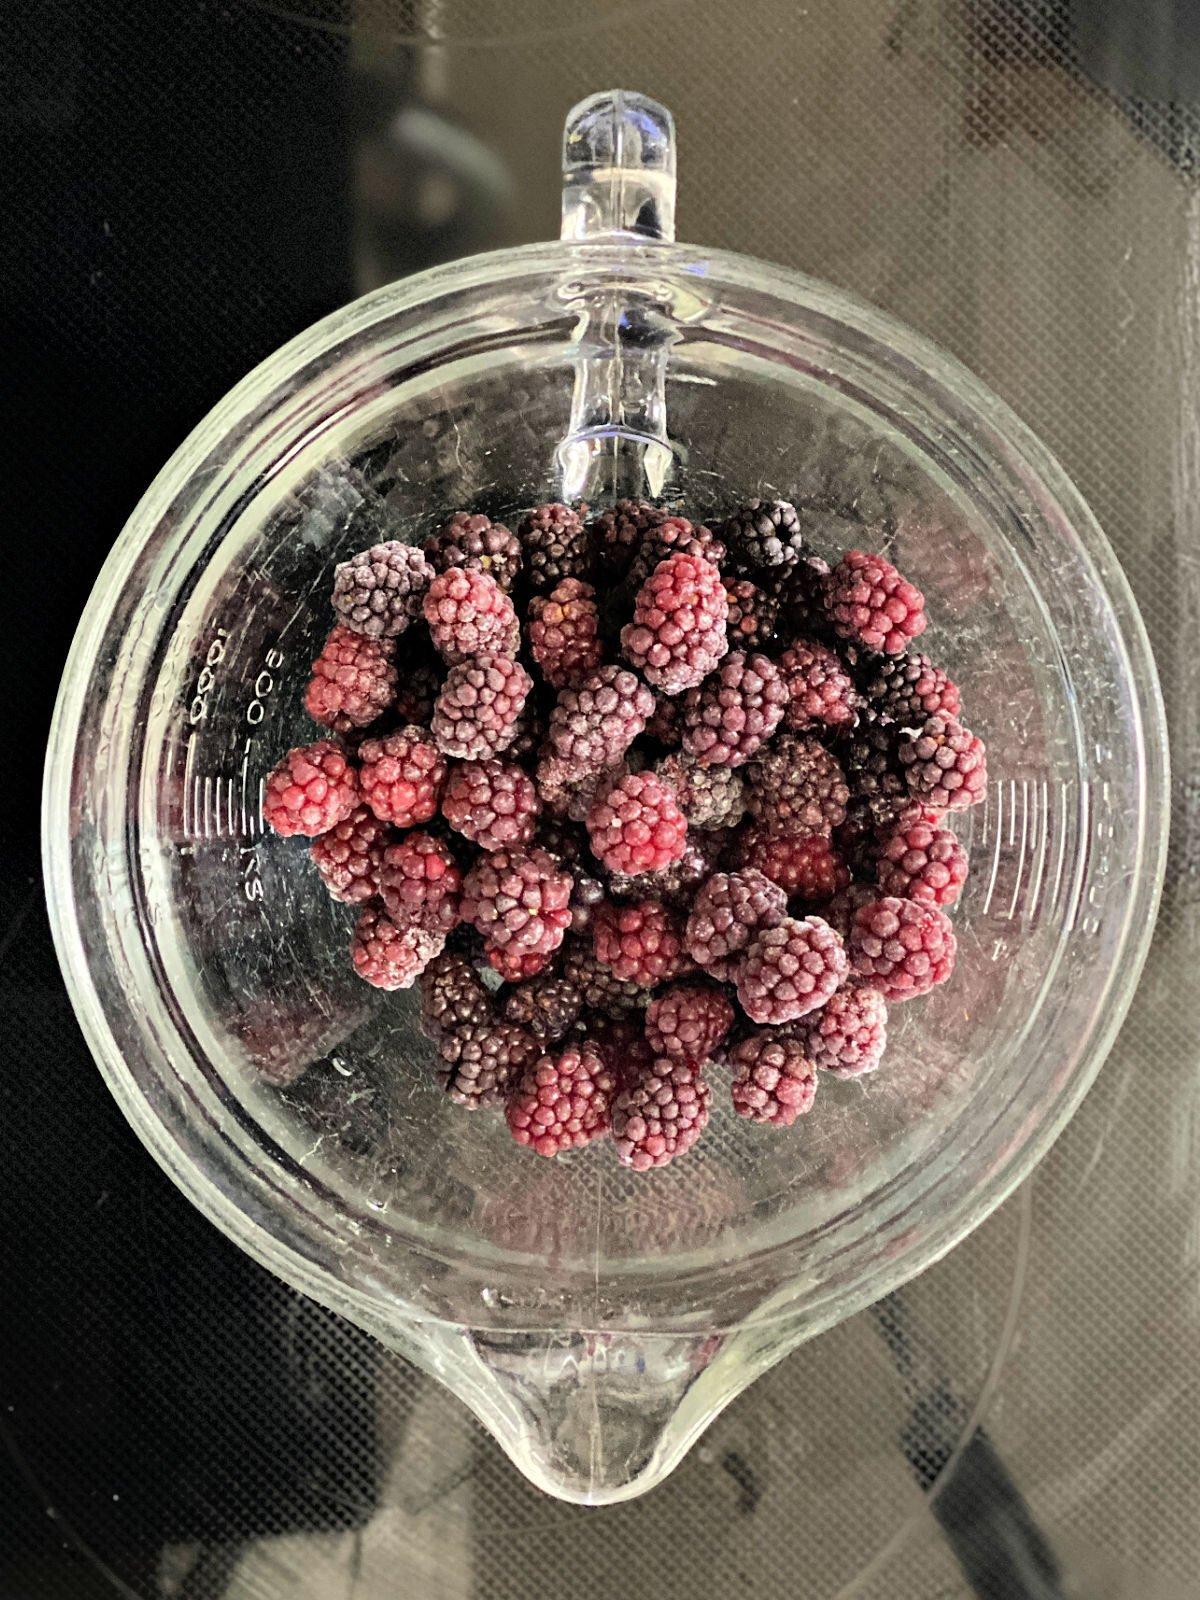 Frozen blackberries in a 2 quart glass measuring cup.